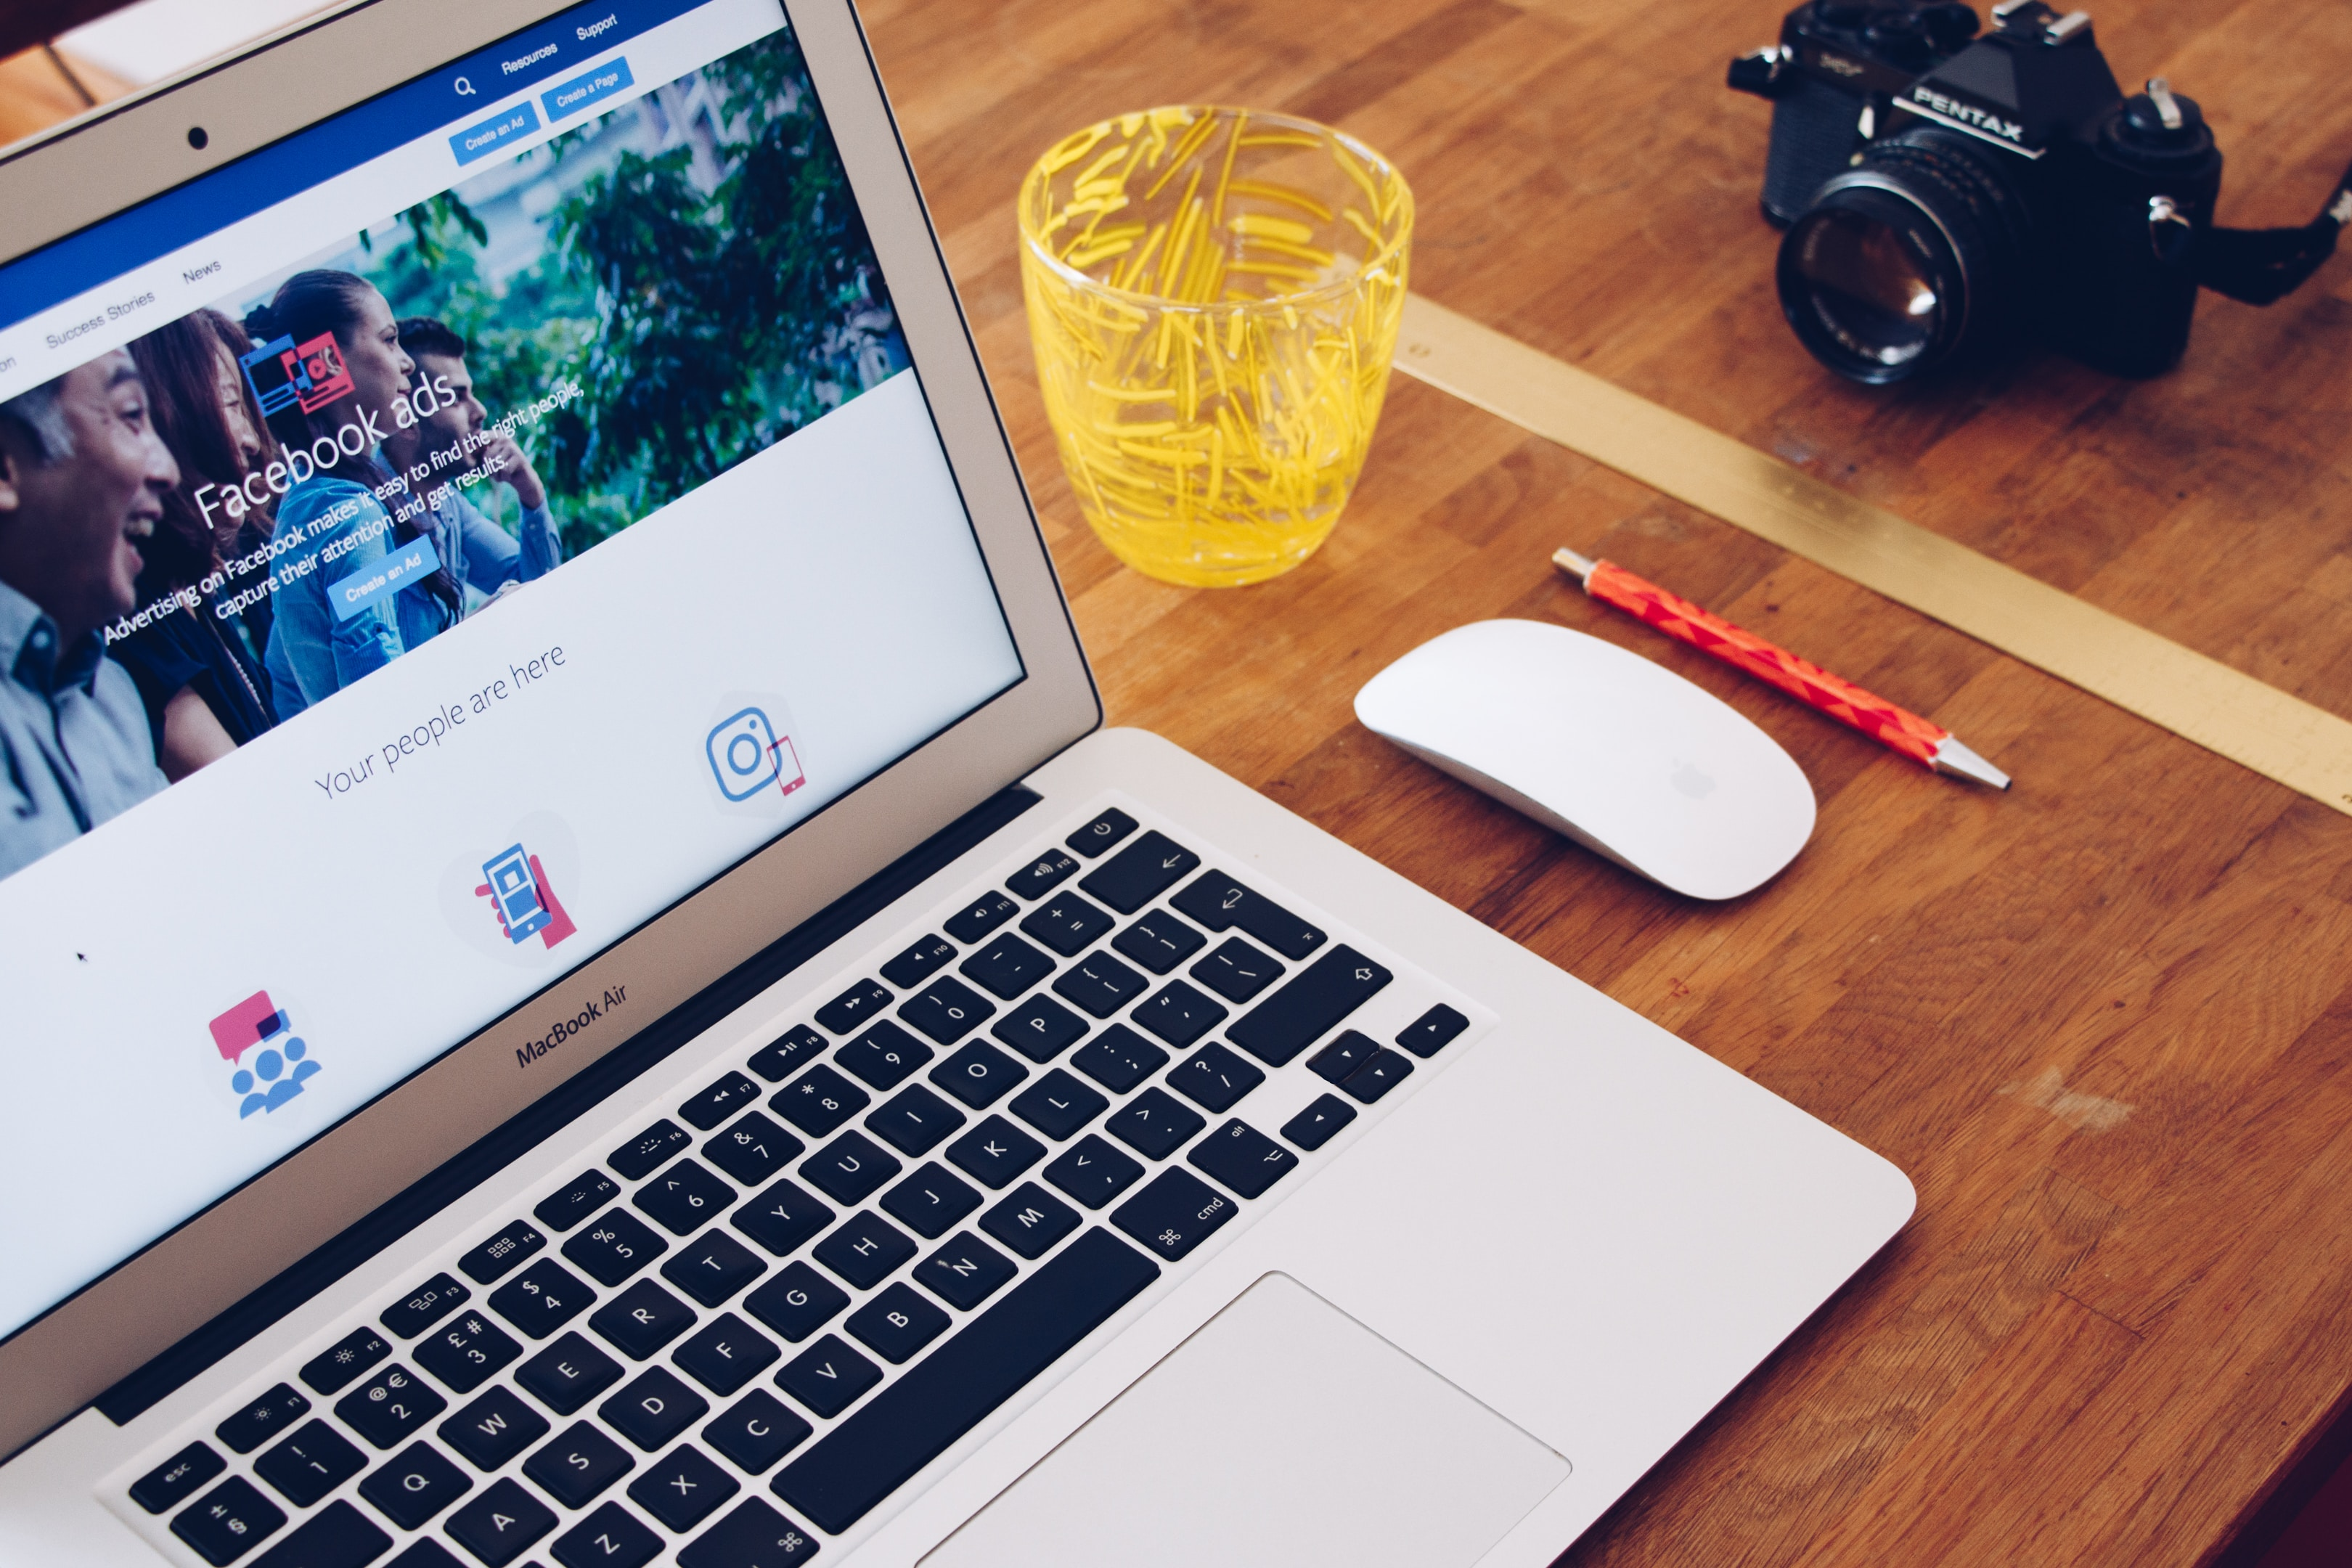 facebook_oglasi_za_male_poduzetnike